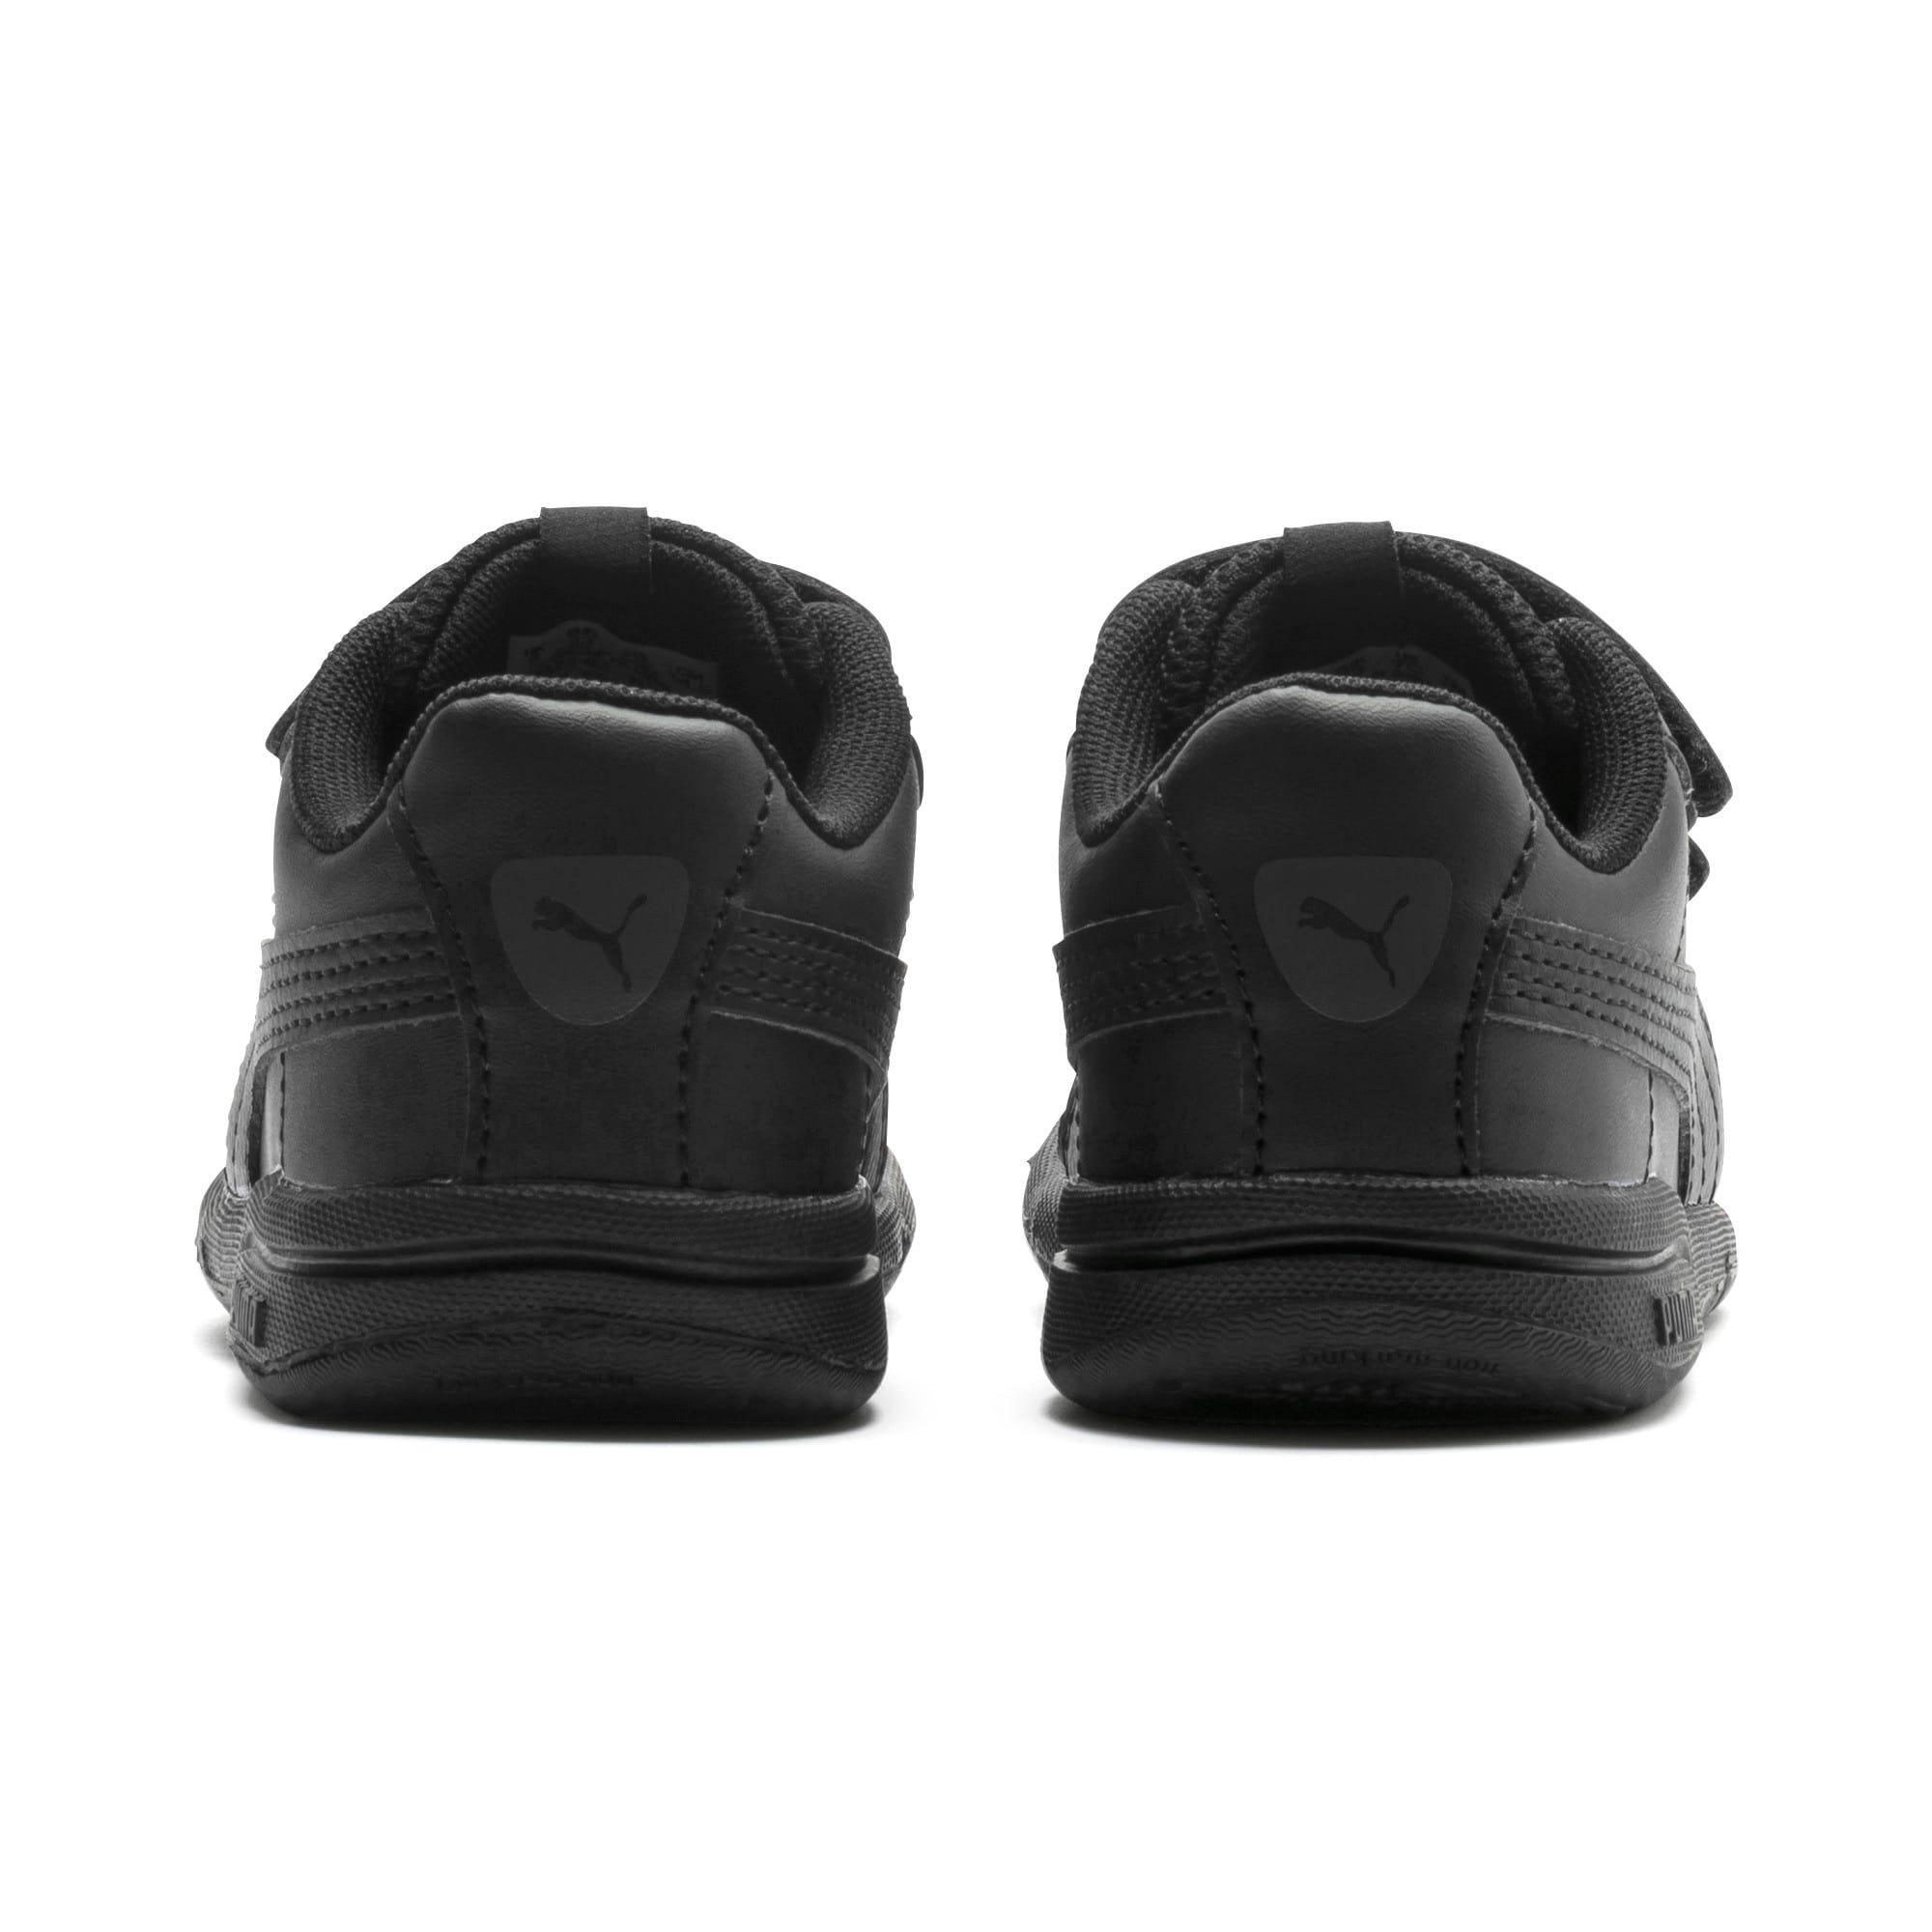 Thumbnail 3 of Basket Stepfleex 2 SL VE V pour bébé, Puma Black-Puma Black, medium